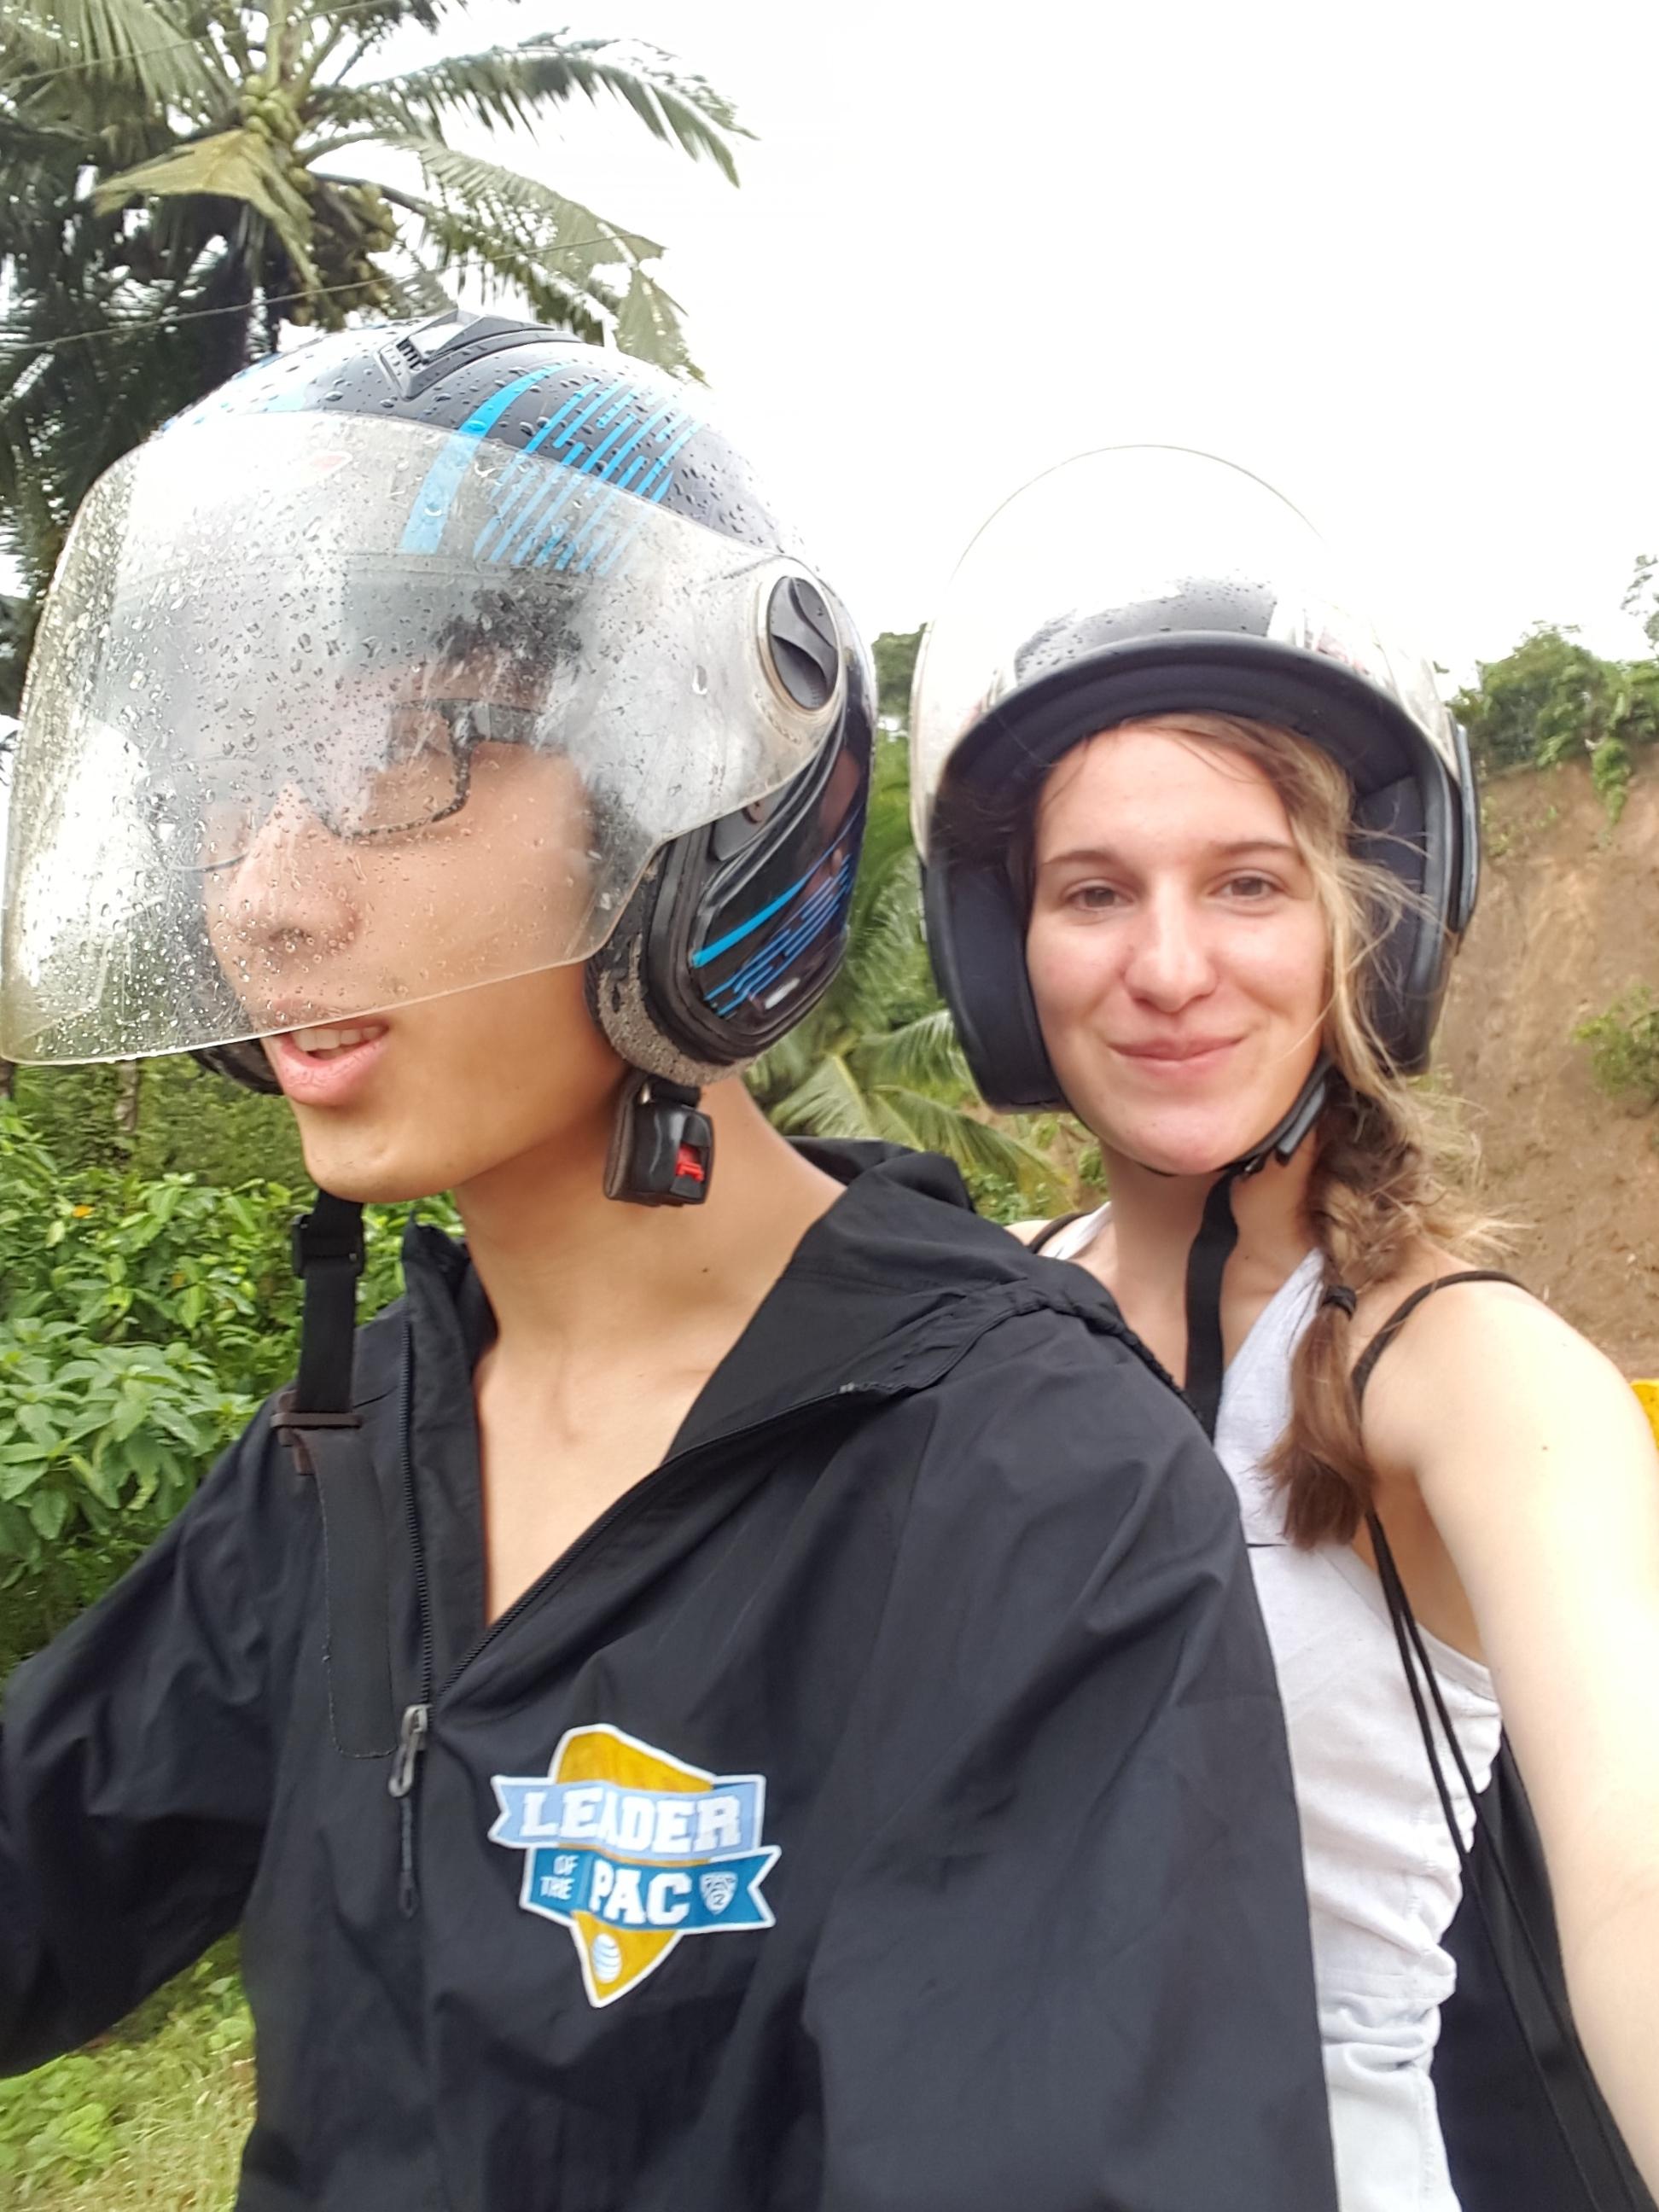 Riding scooters in El Nido